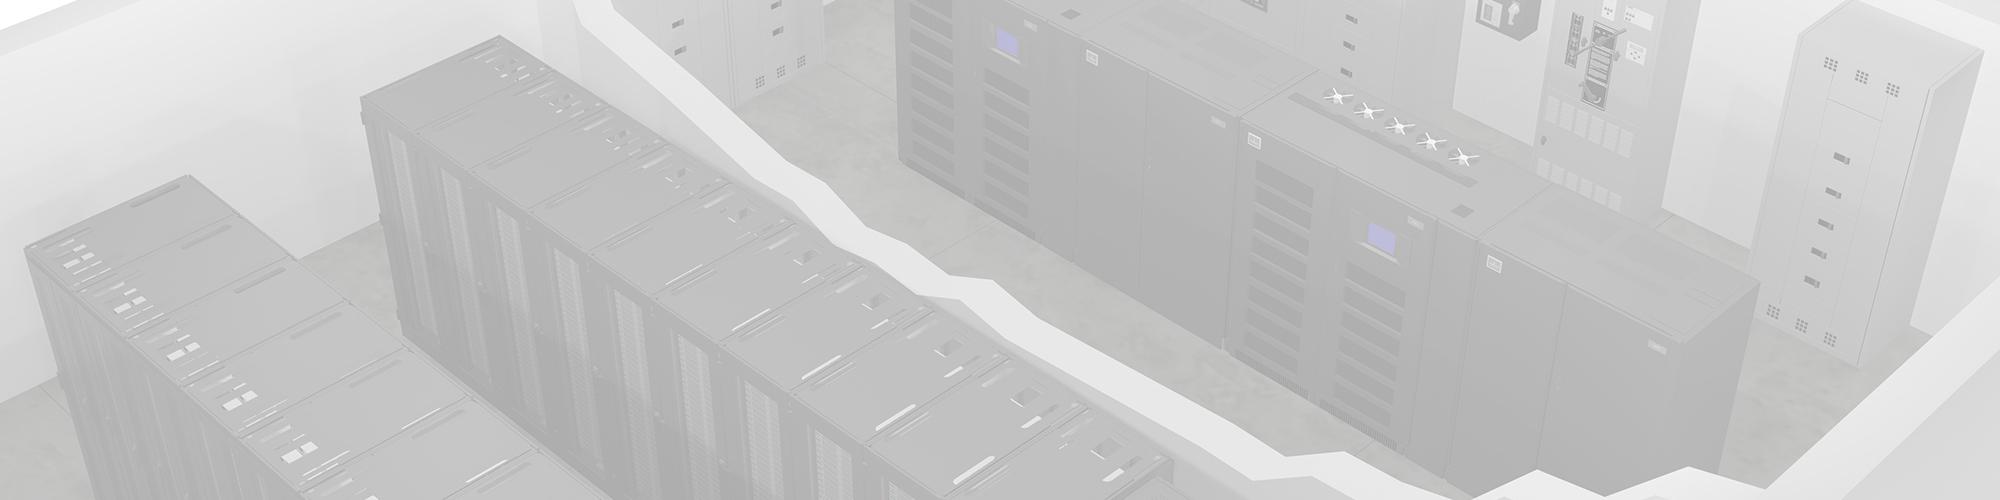 LMD_HP-Banner-Dynamic_bkgrnd-blank-e1424898669315